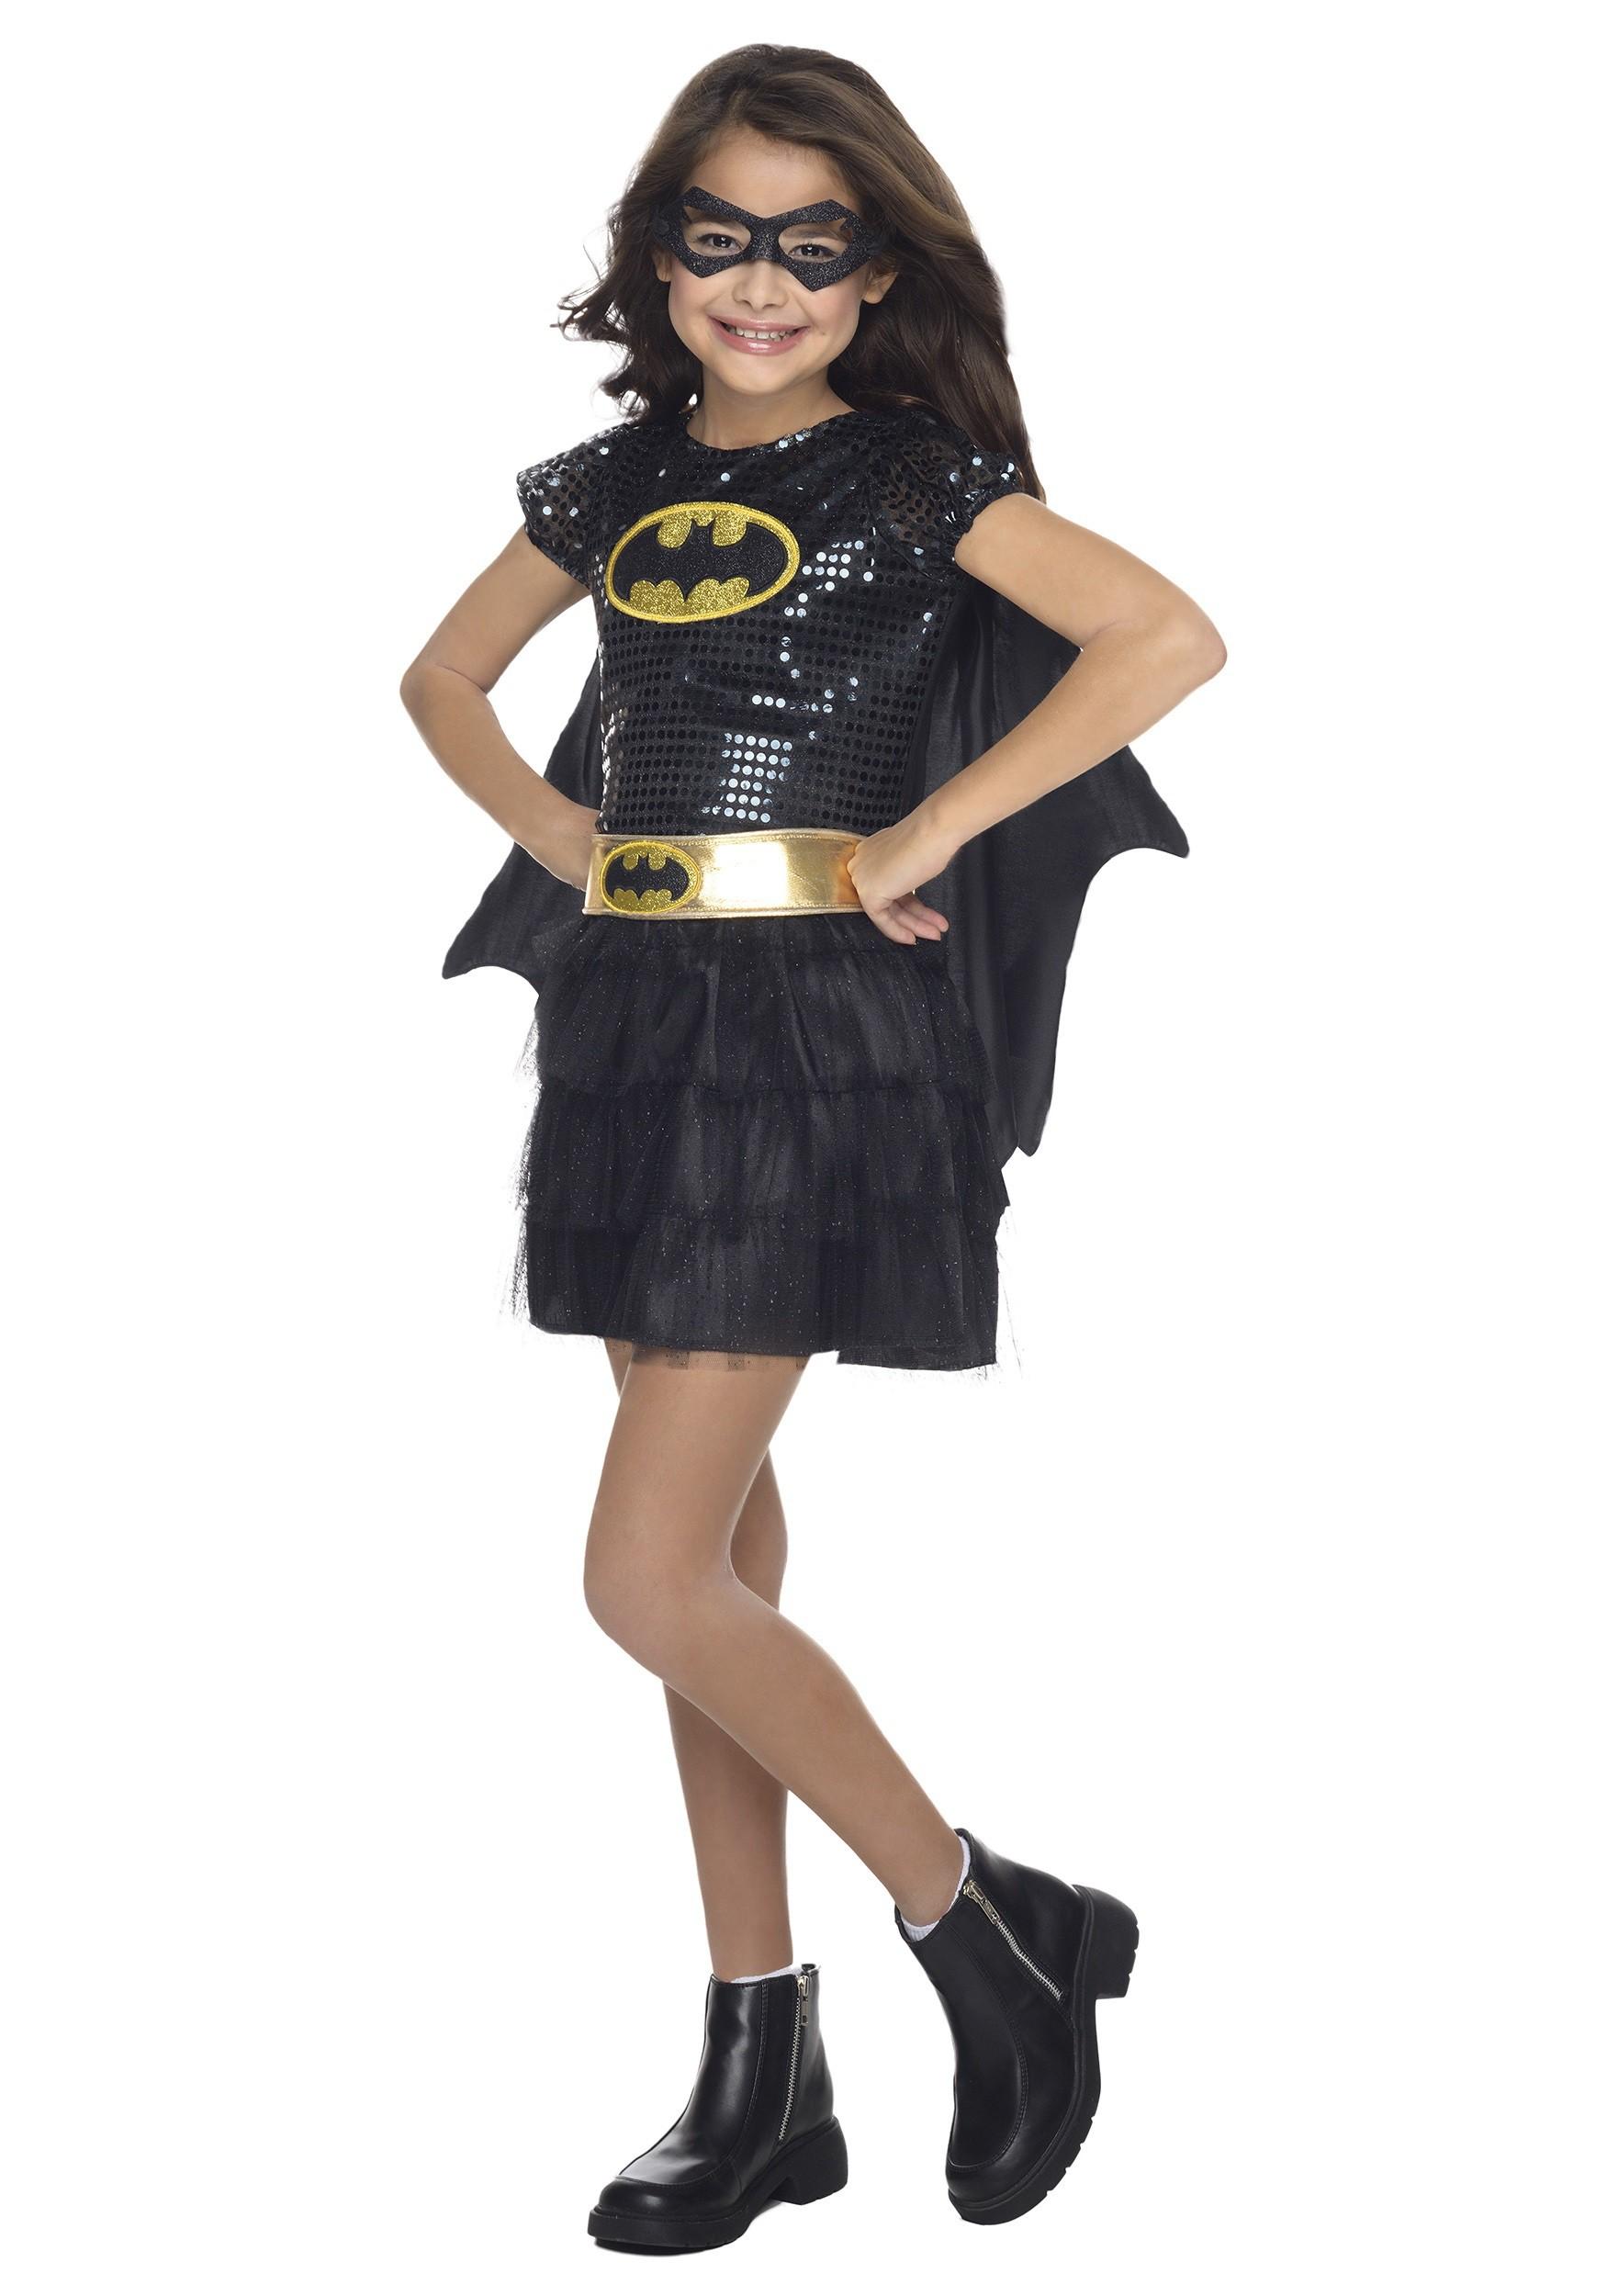 Toddler Batgirl Sequin Costume  sc 1 st  Halloween Costumes & Child Batgirl Sequined Costume